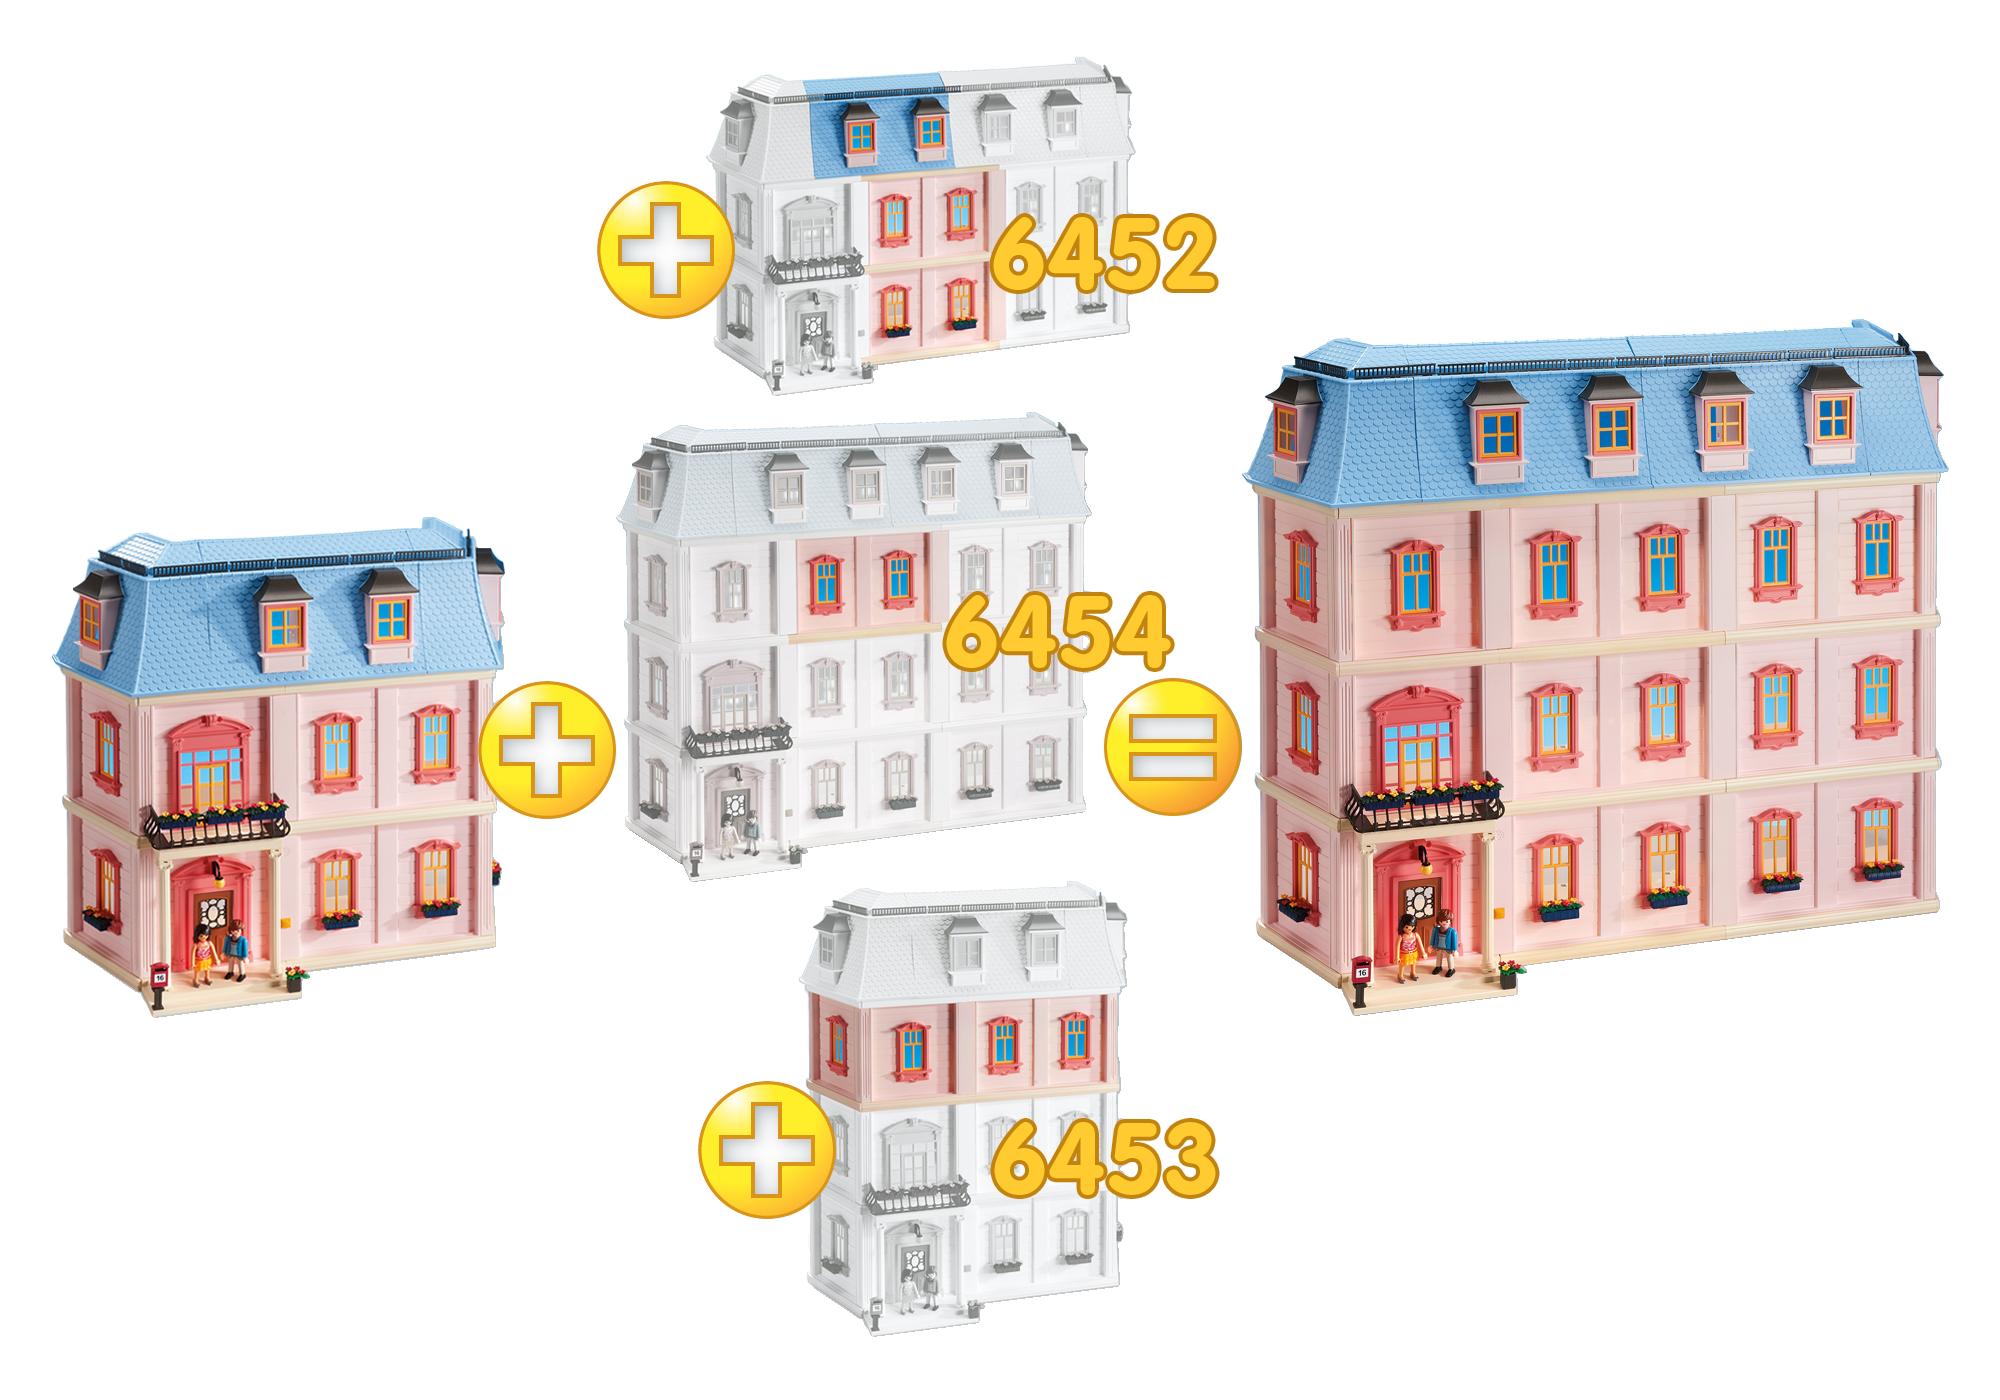 http://media.playmobil.com/i/playmobil/6454_product_extra1/Extensión C para la Casa de Muñecas Romántica (ref. 5303)